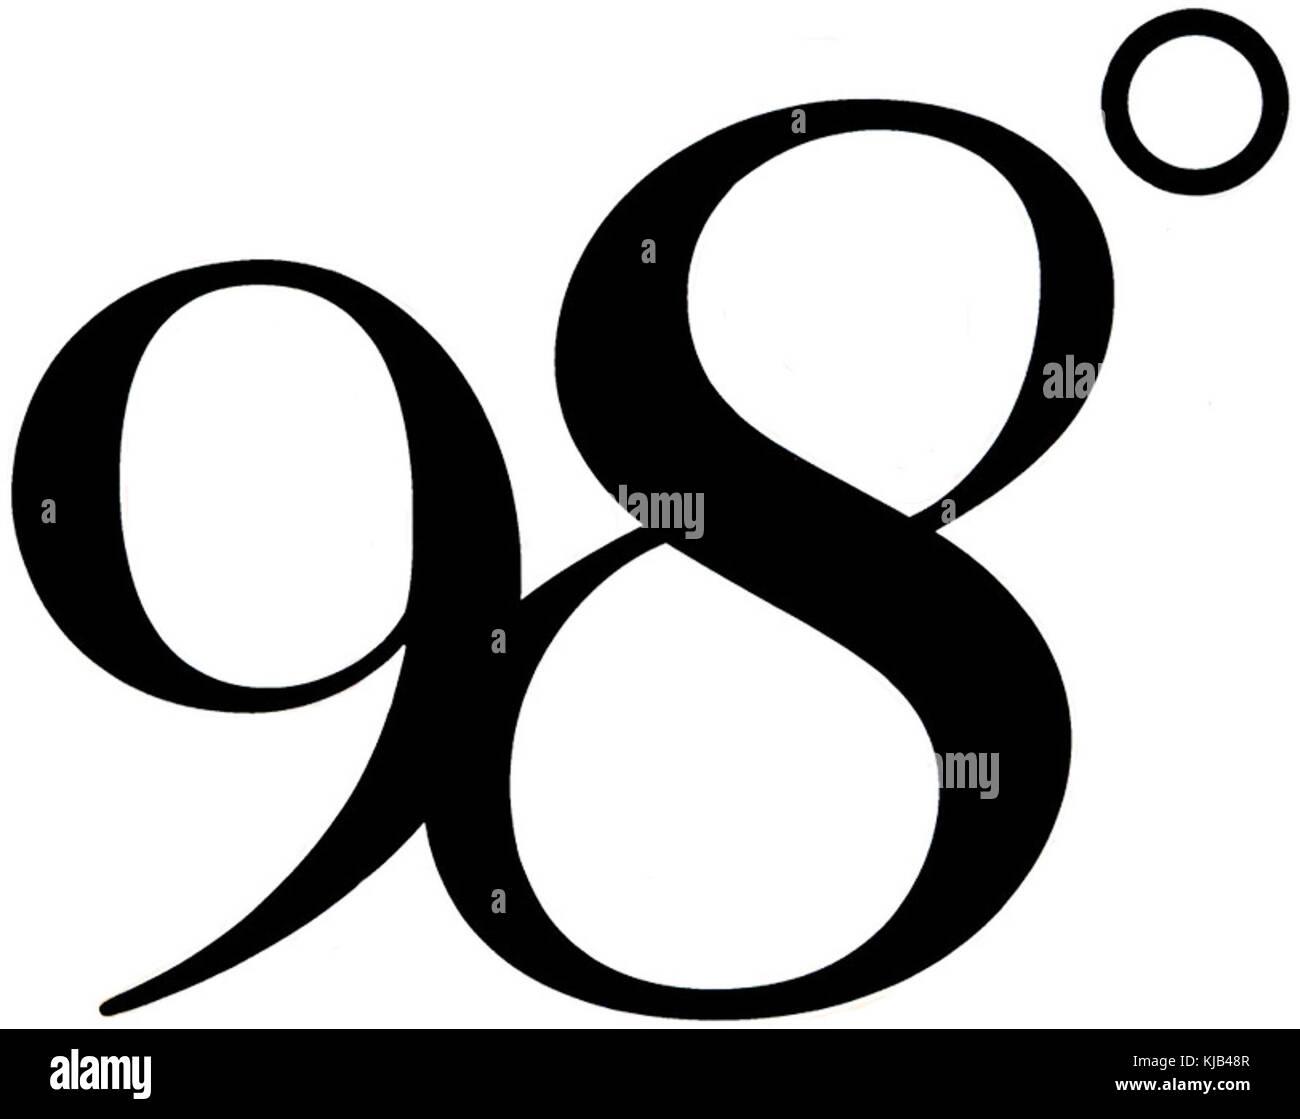 98 degrees stock photos 98 degrees stock images alamy 98 degrees logo stock image biocorpaavc Choice Image